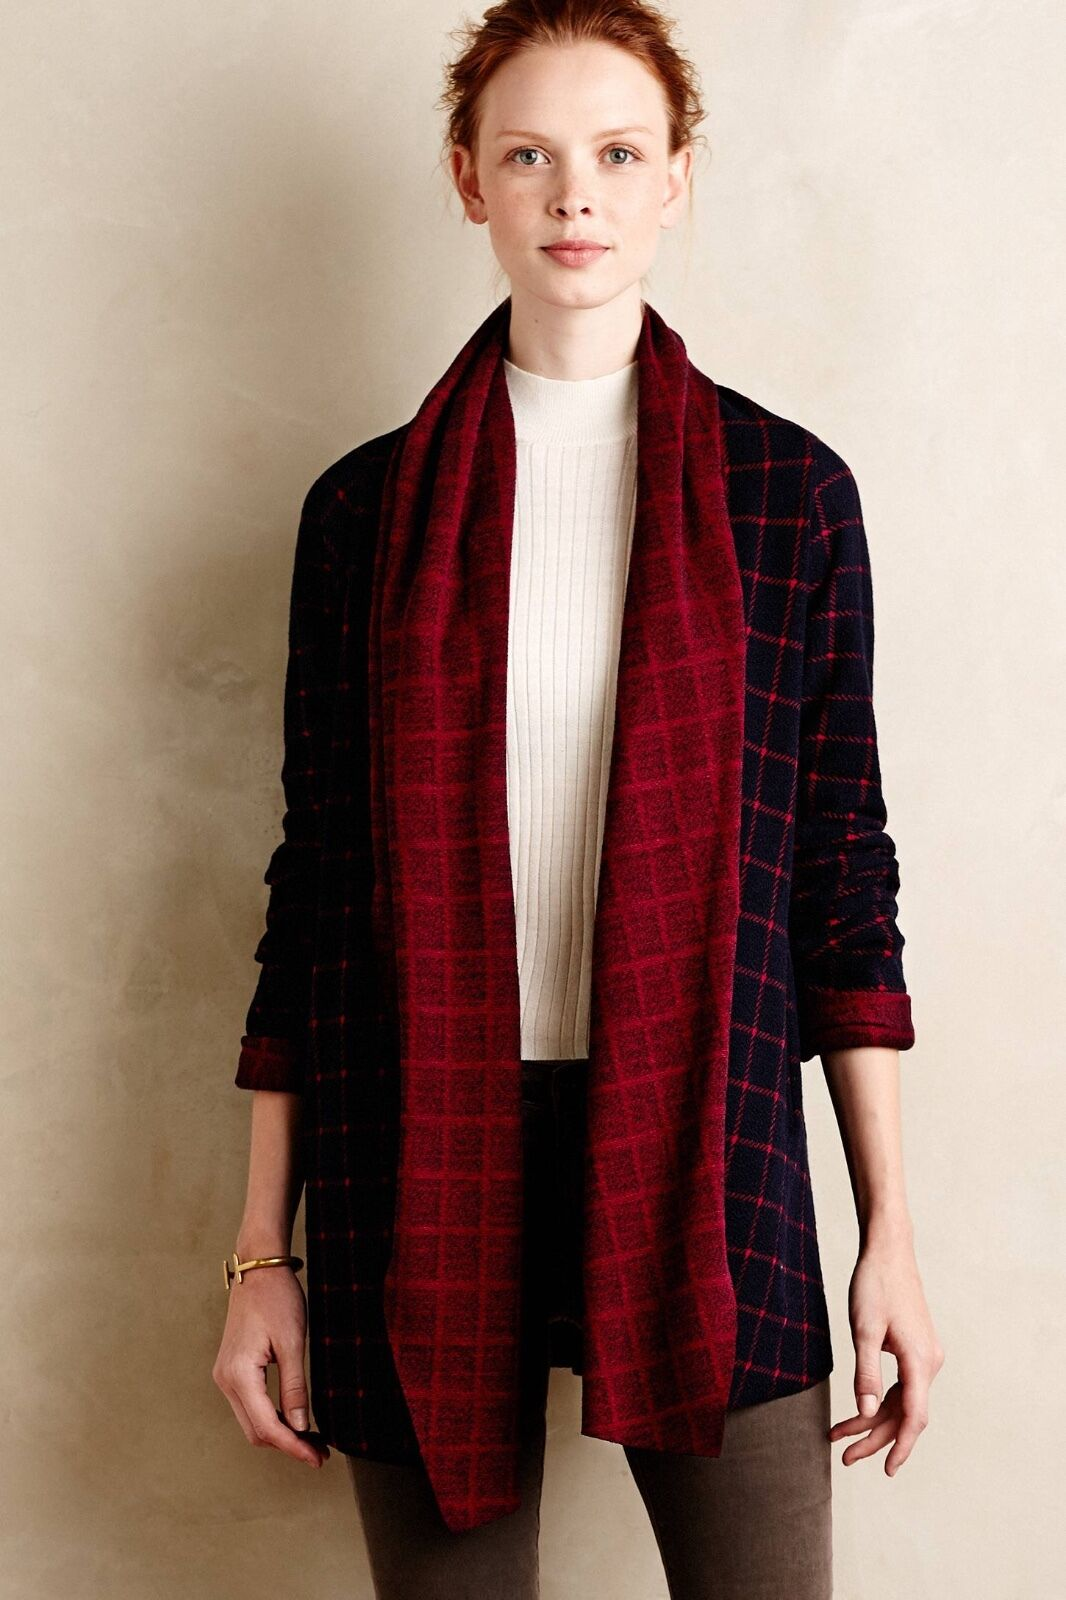 NWT Anthropologie Windowpane Shawl Cardigan Sweater Size M